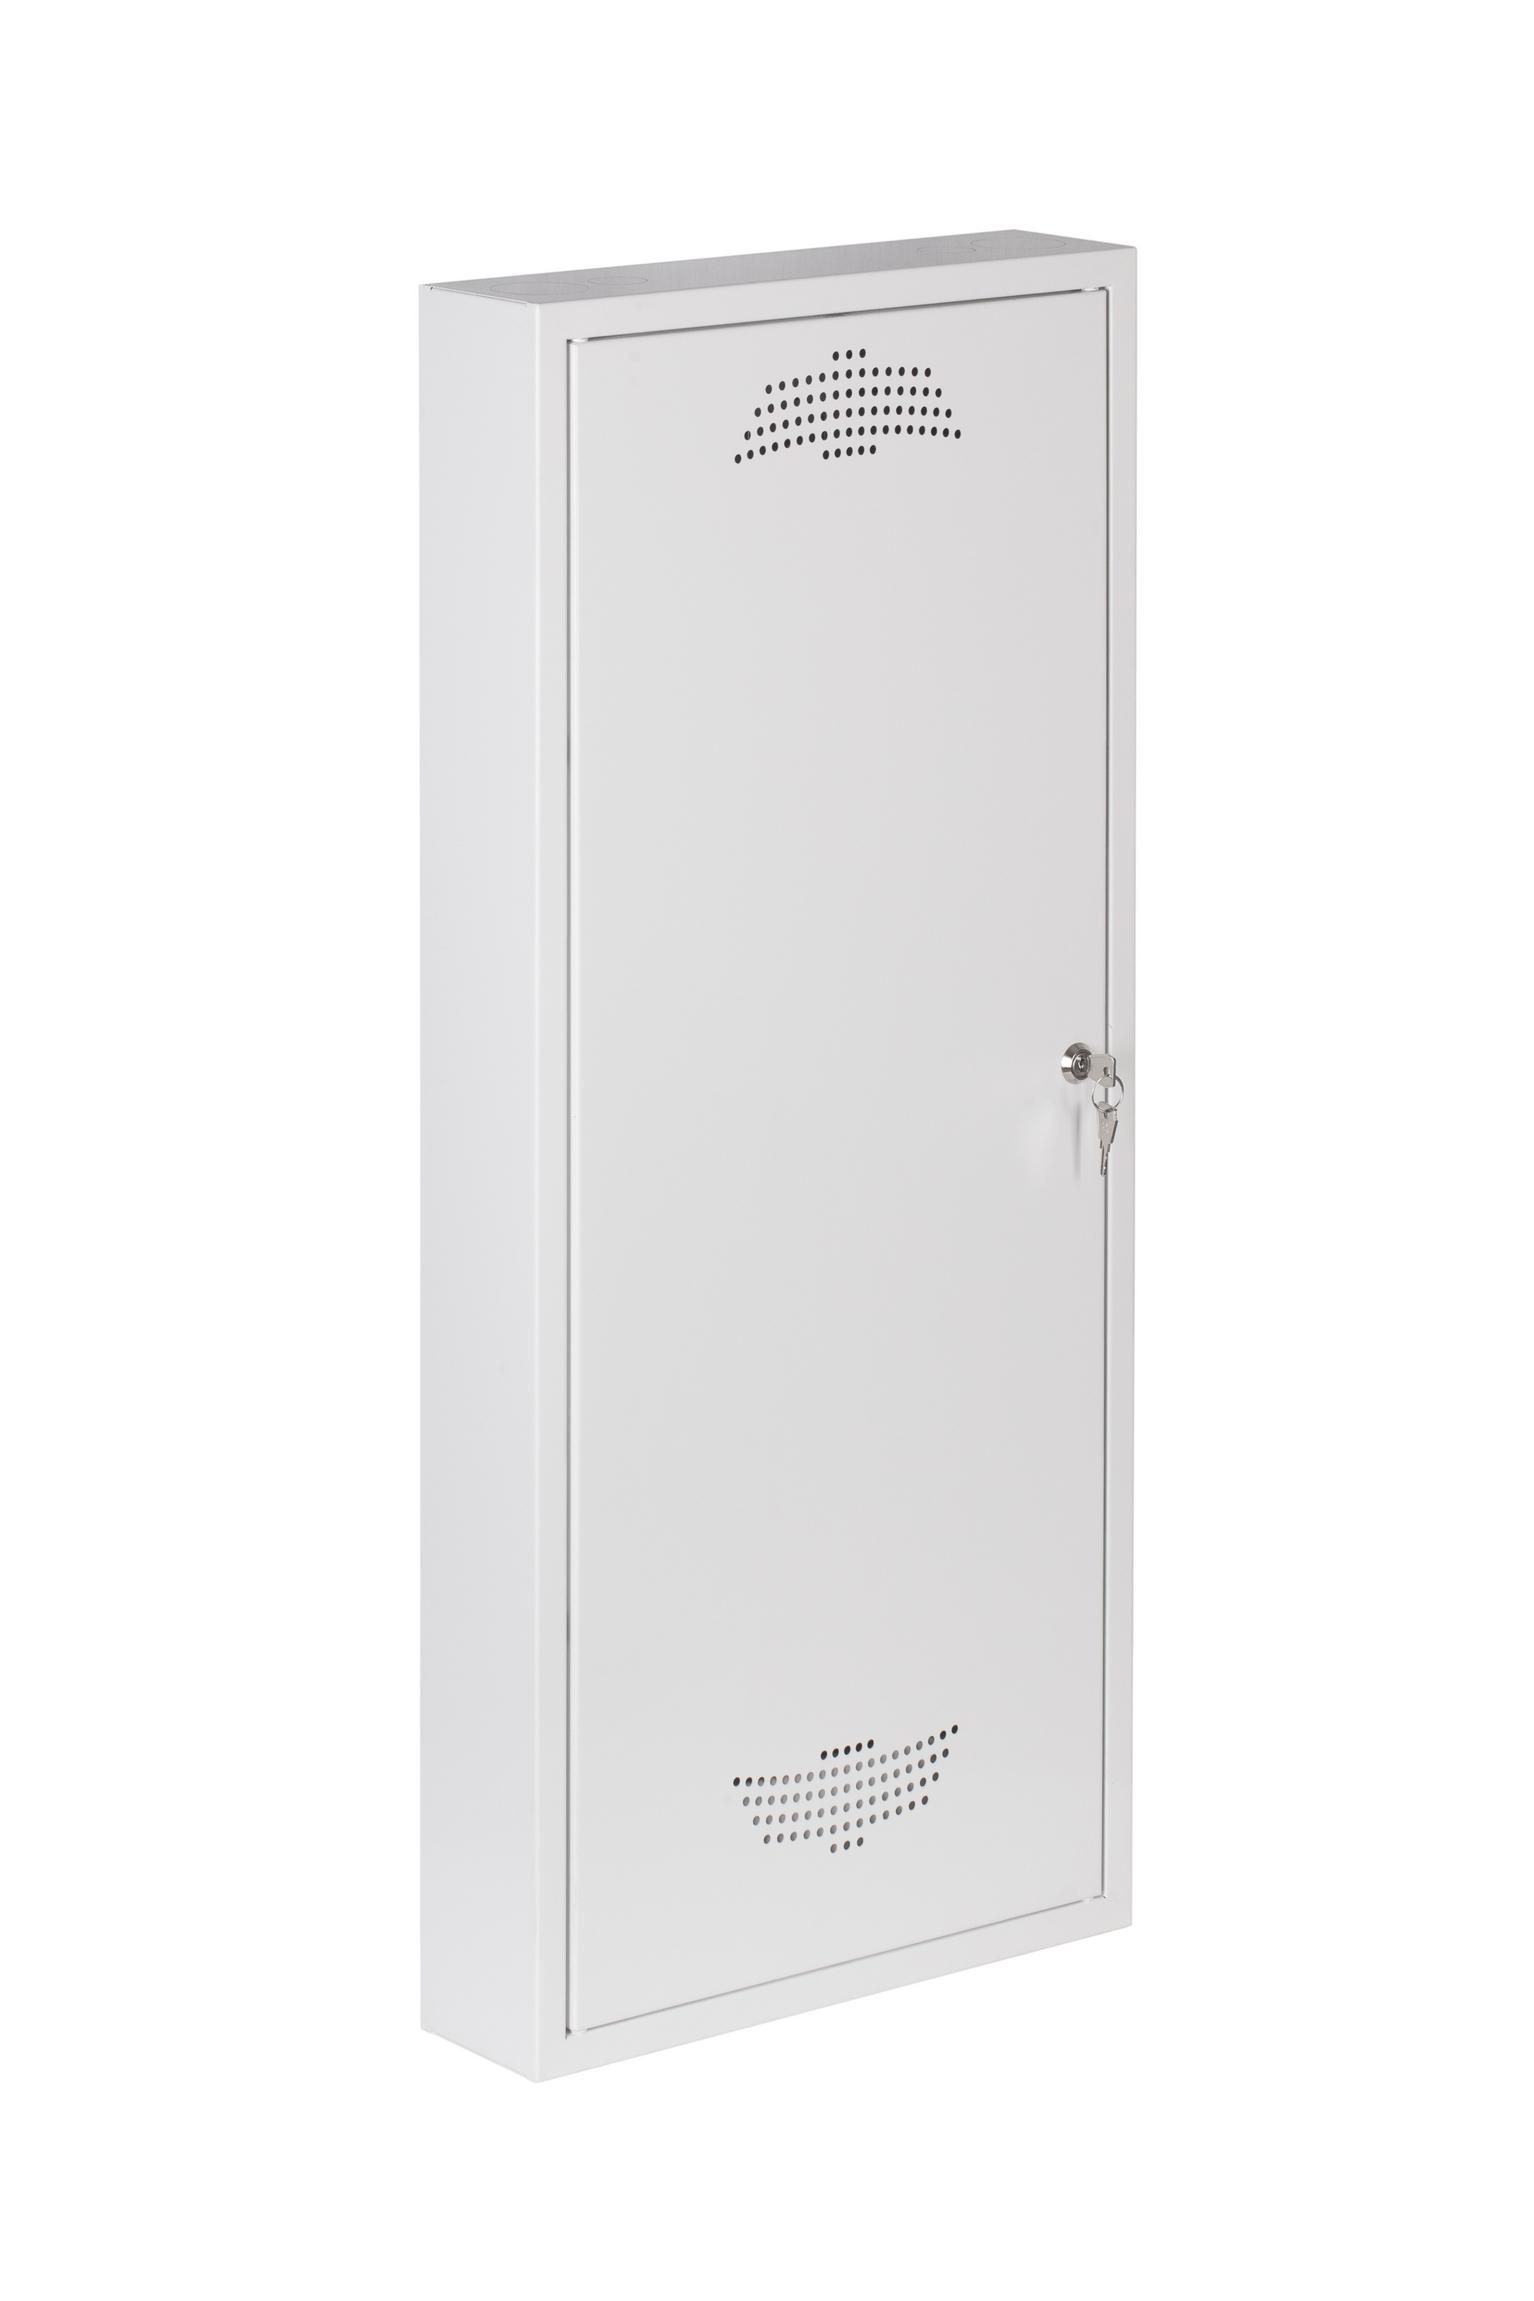 Szafka Multimedialna Fttmax 900 Sabaj System Sp. z o.o #6A6561